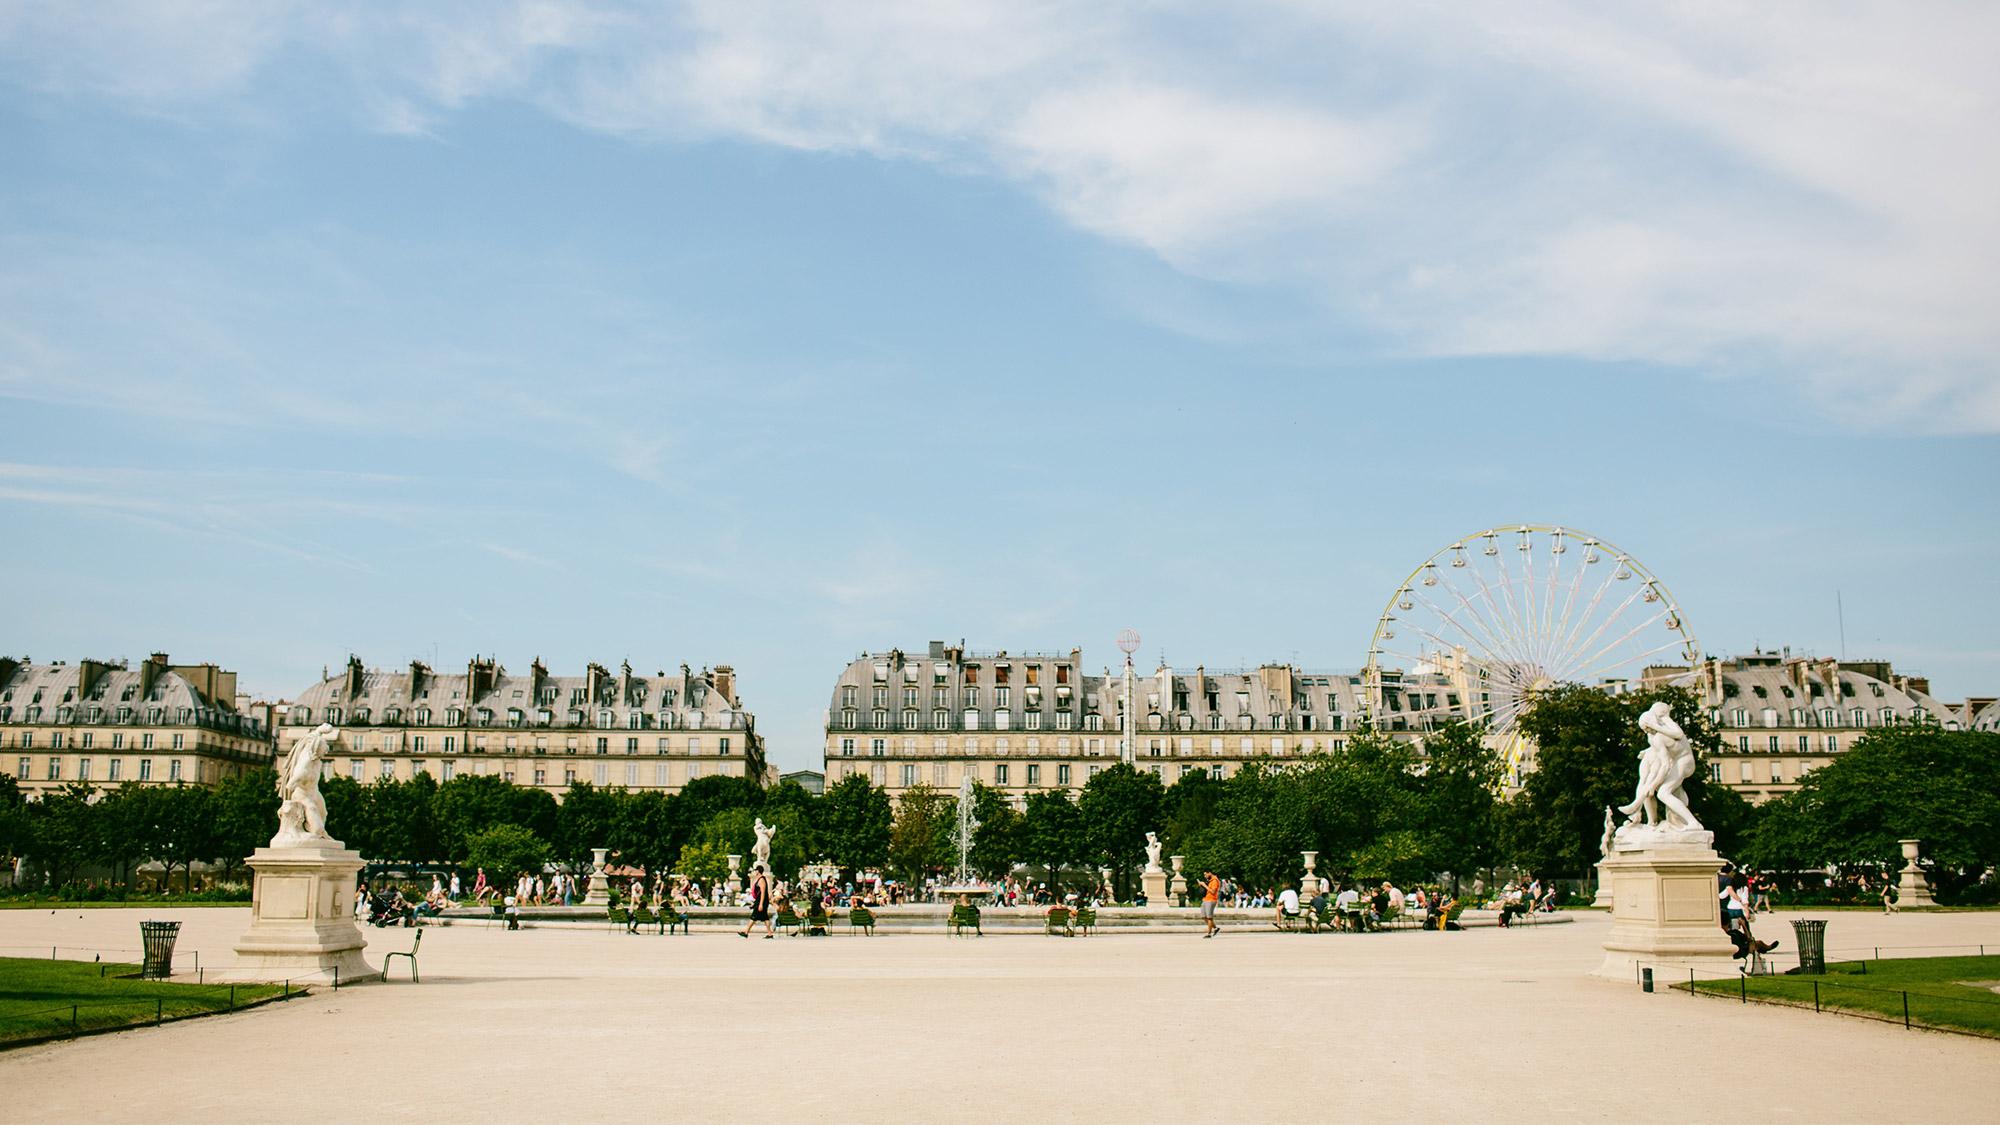 Panoramic photo of a park in Paris.